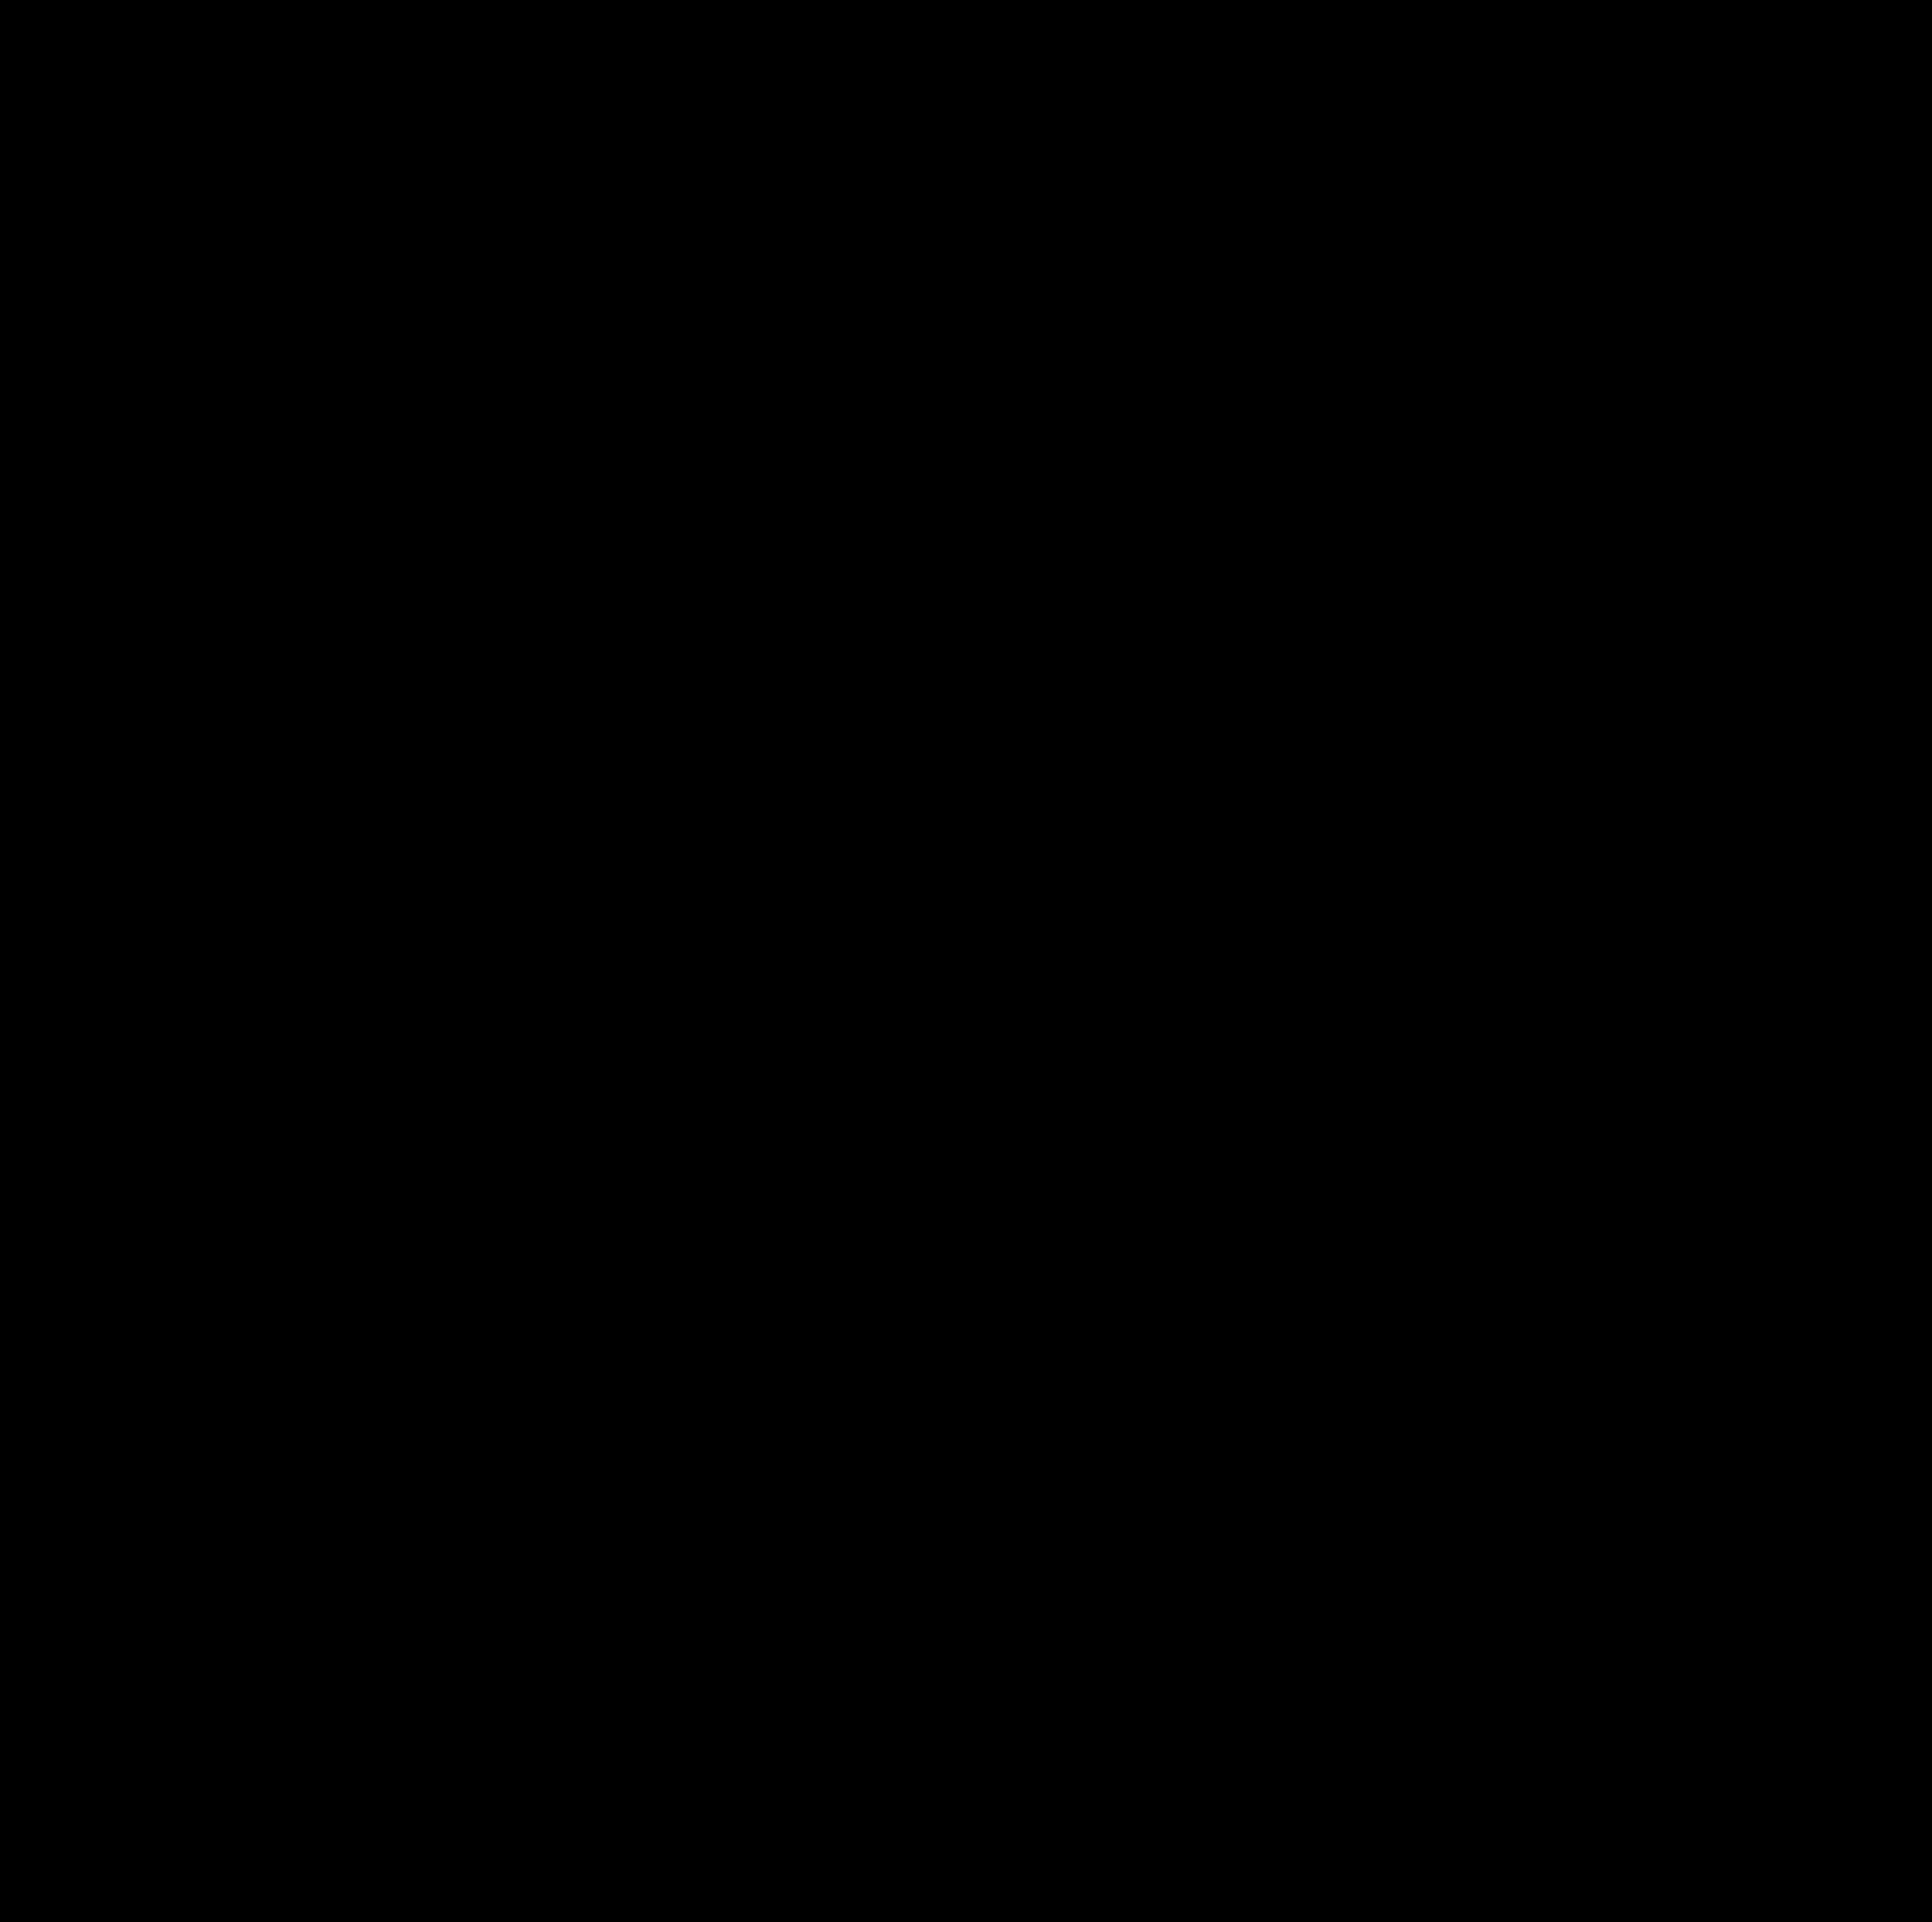 panthers paw logo - photo #28